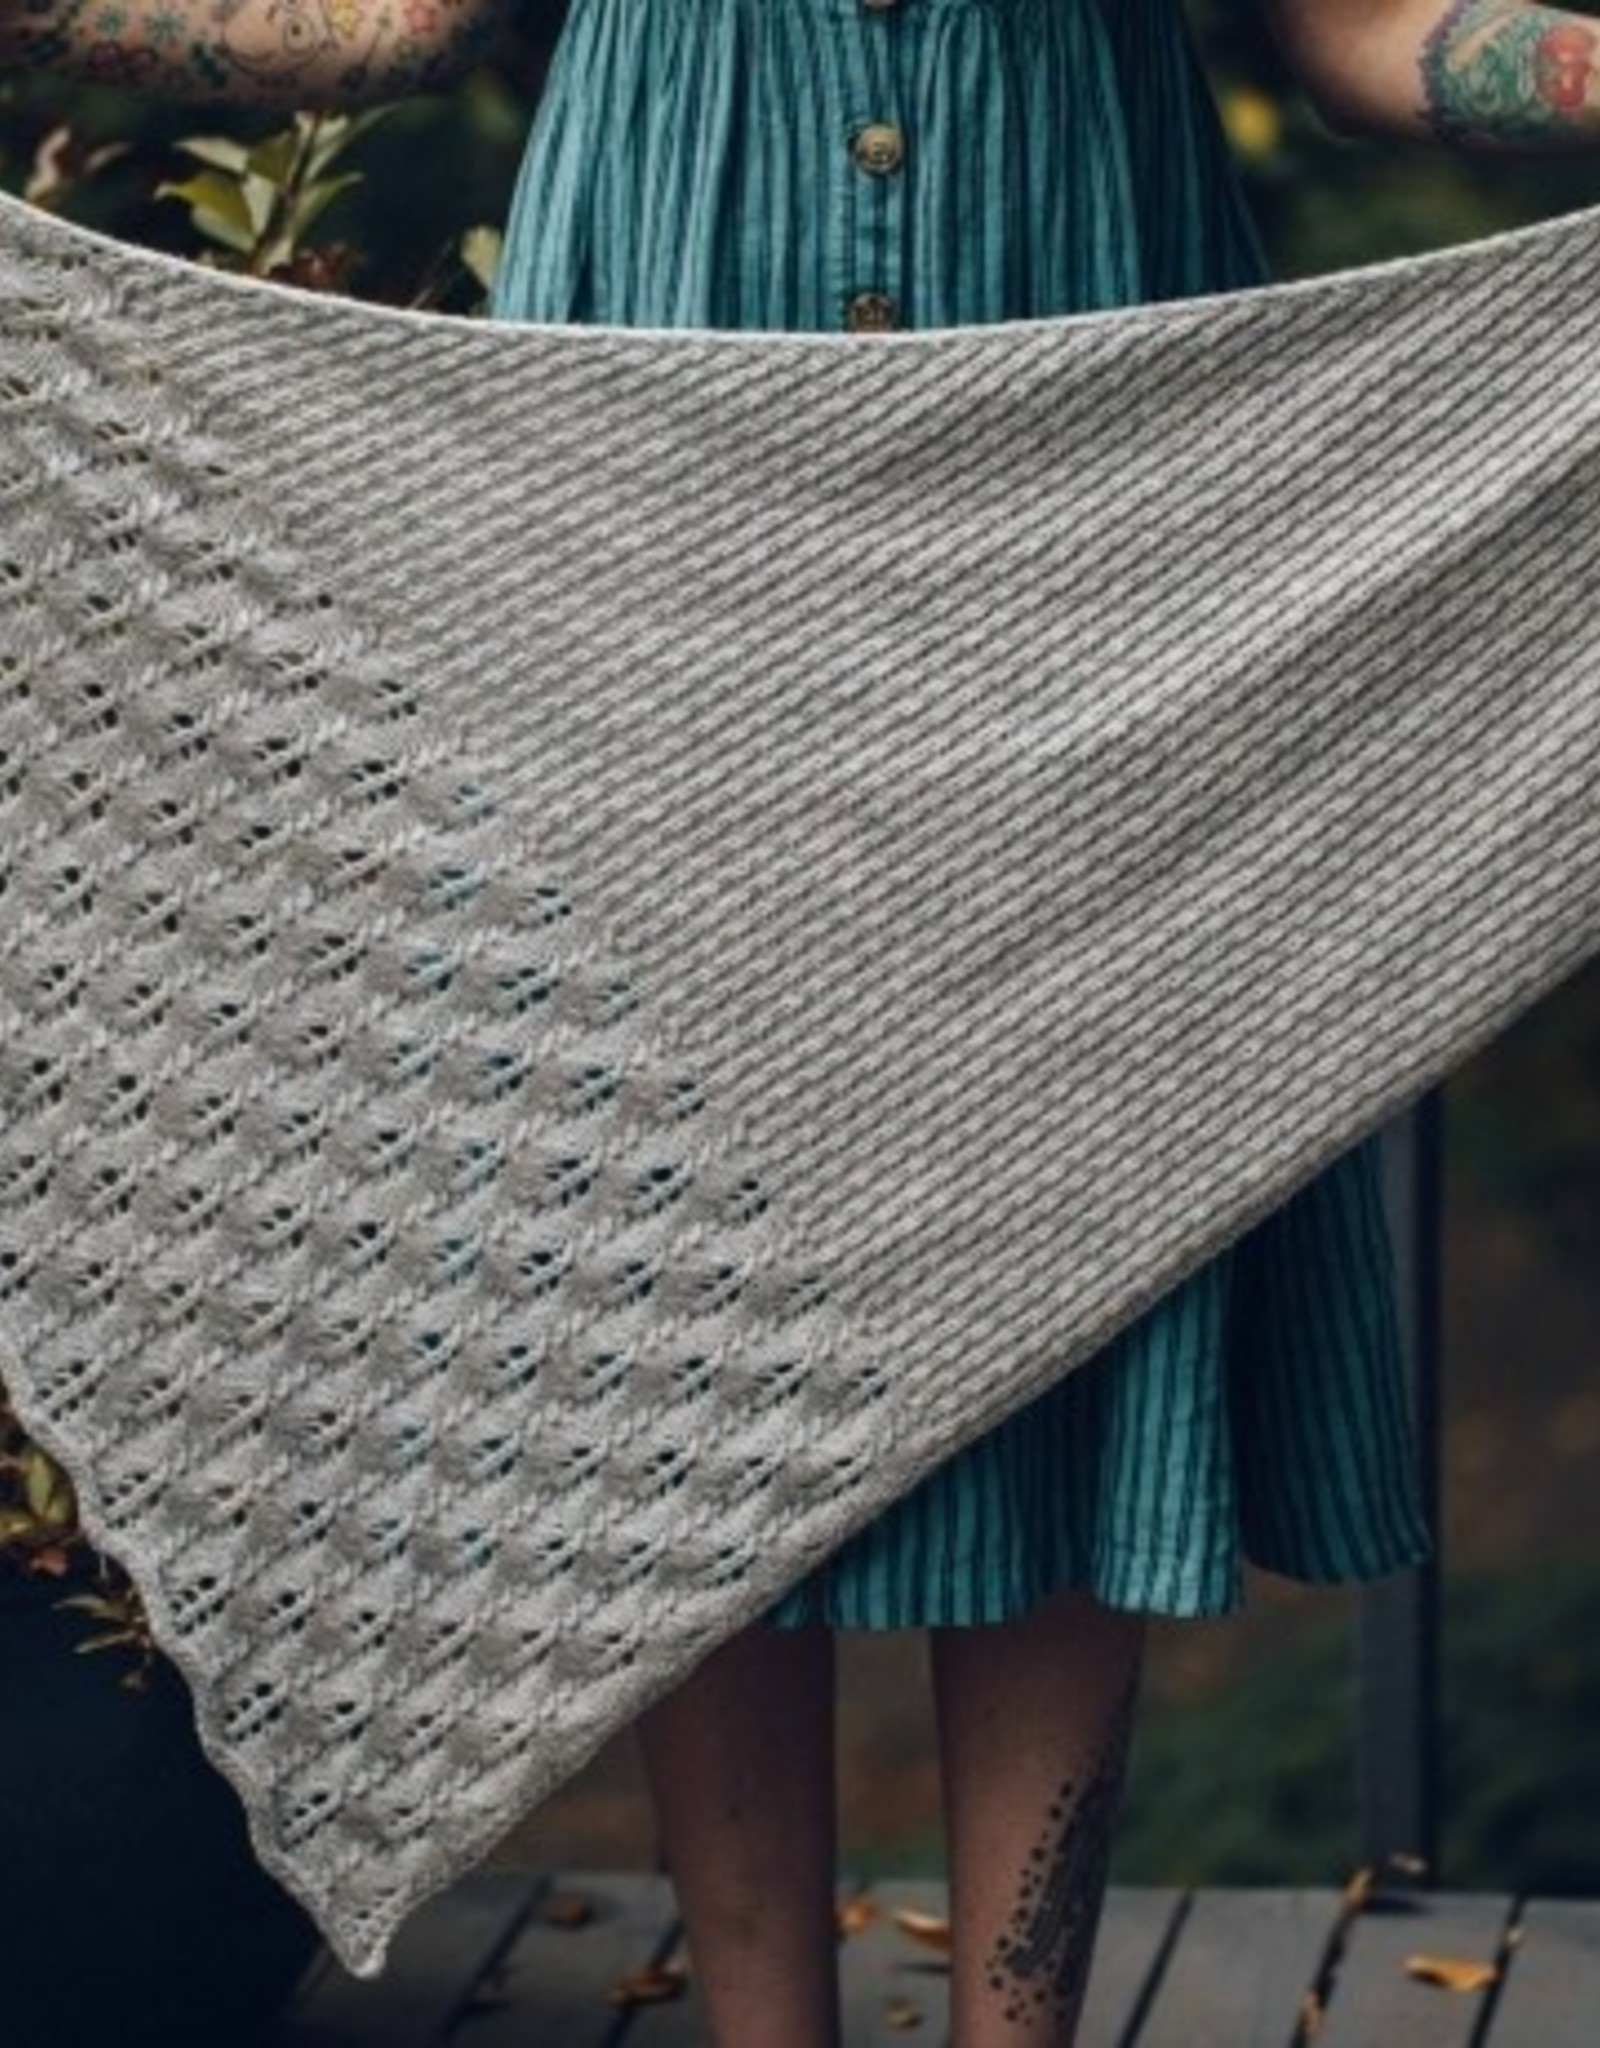 Knit Project - Hoarfrost Shawl (Class B)